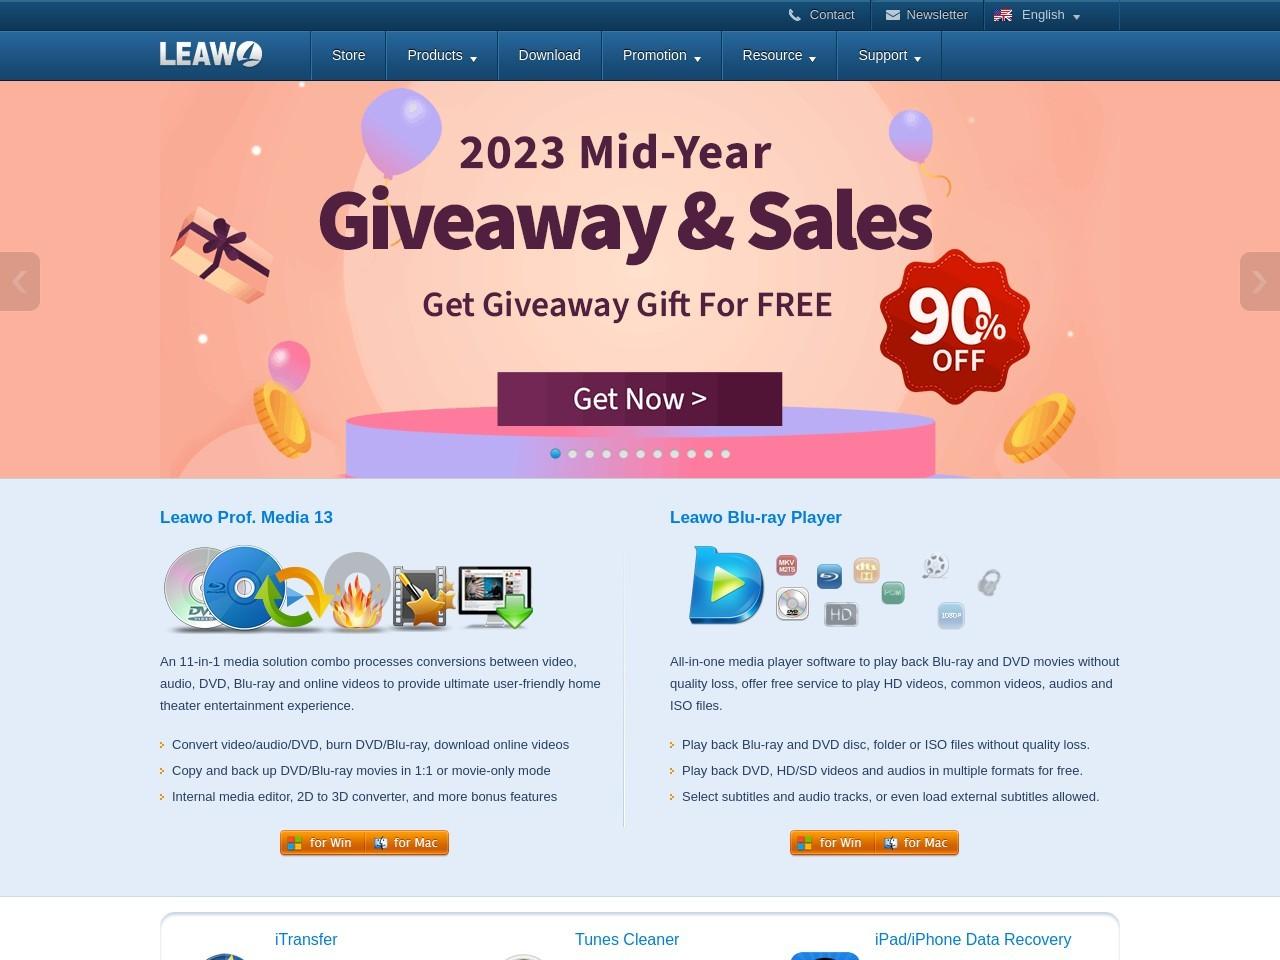 Leawo Prof. Media Ultra Promo Code